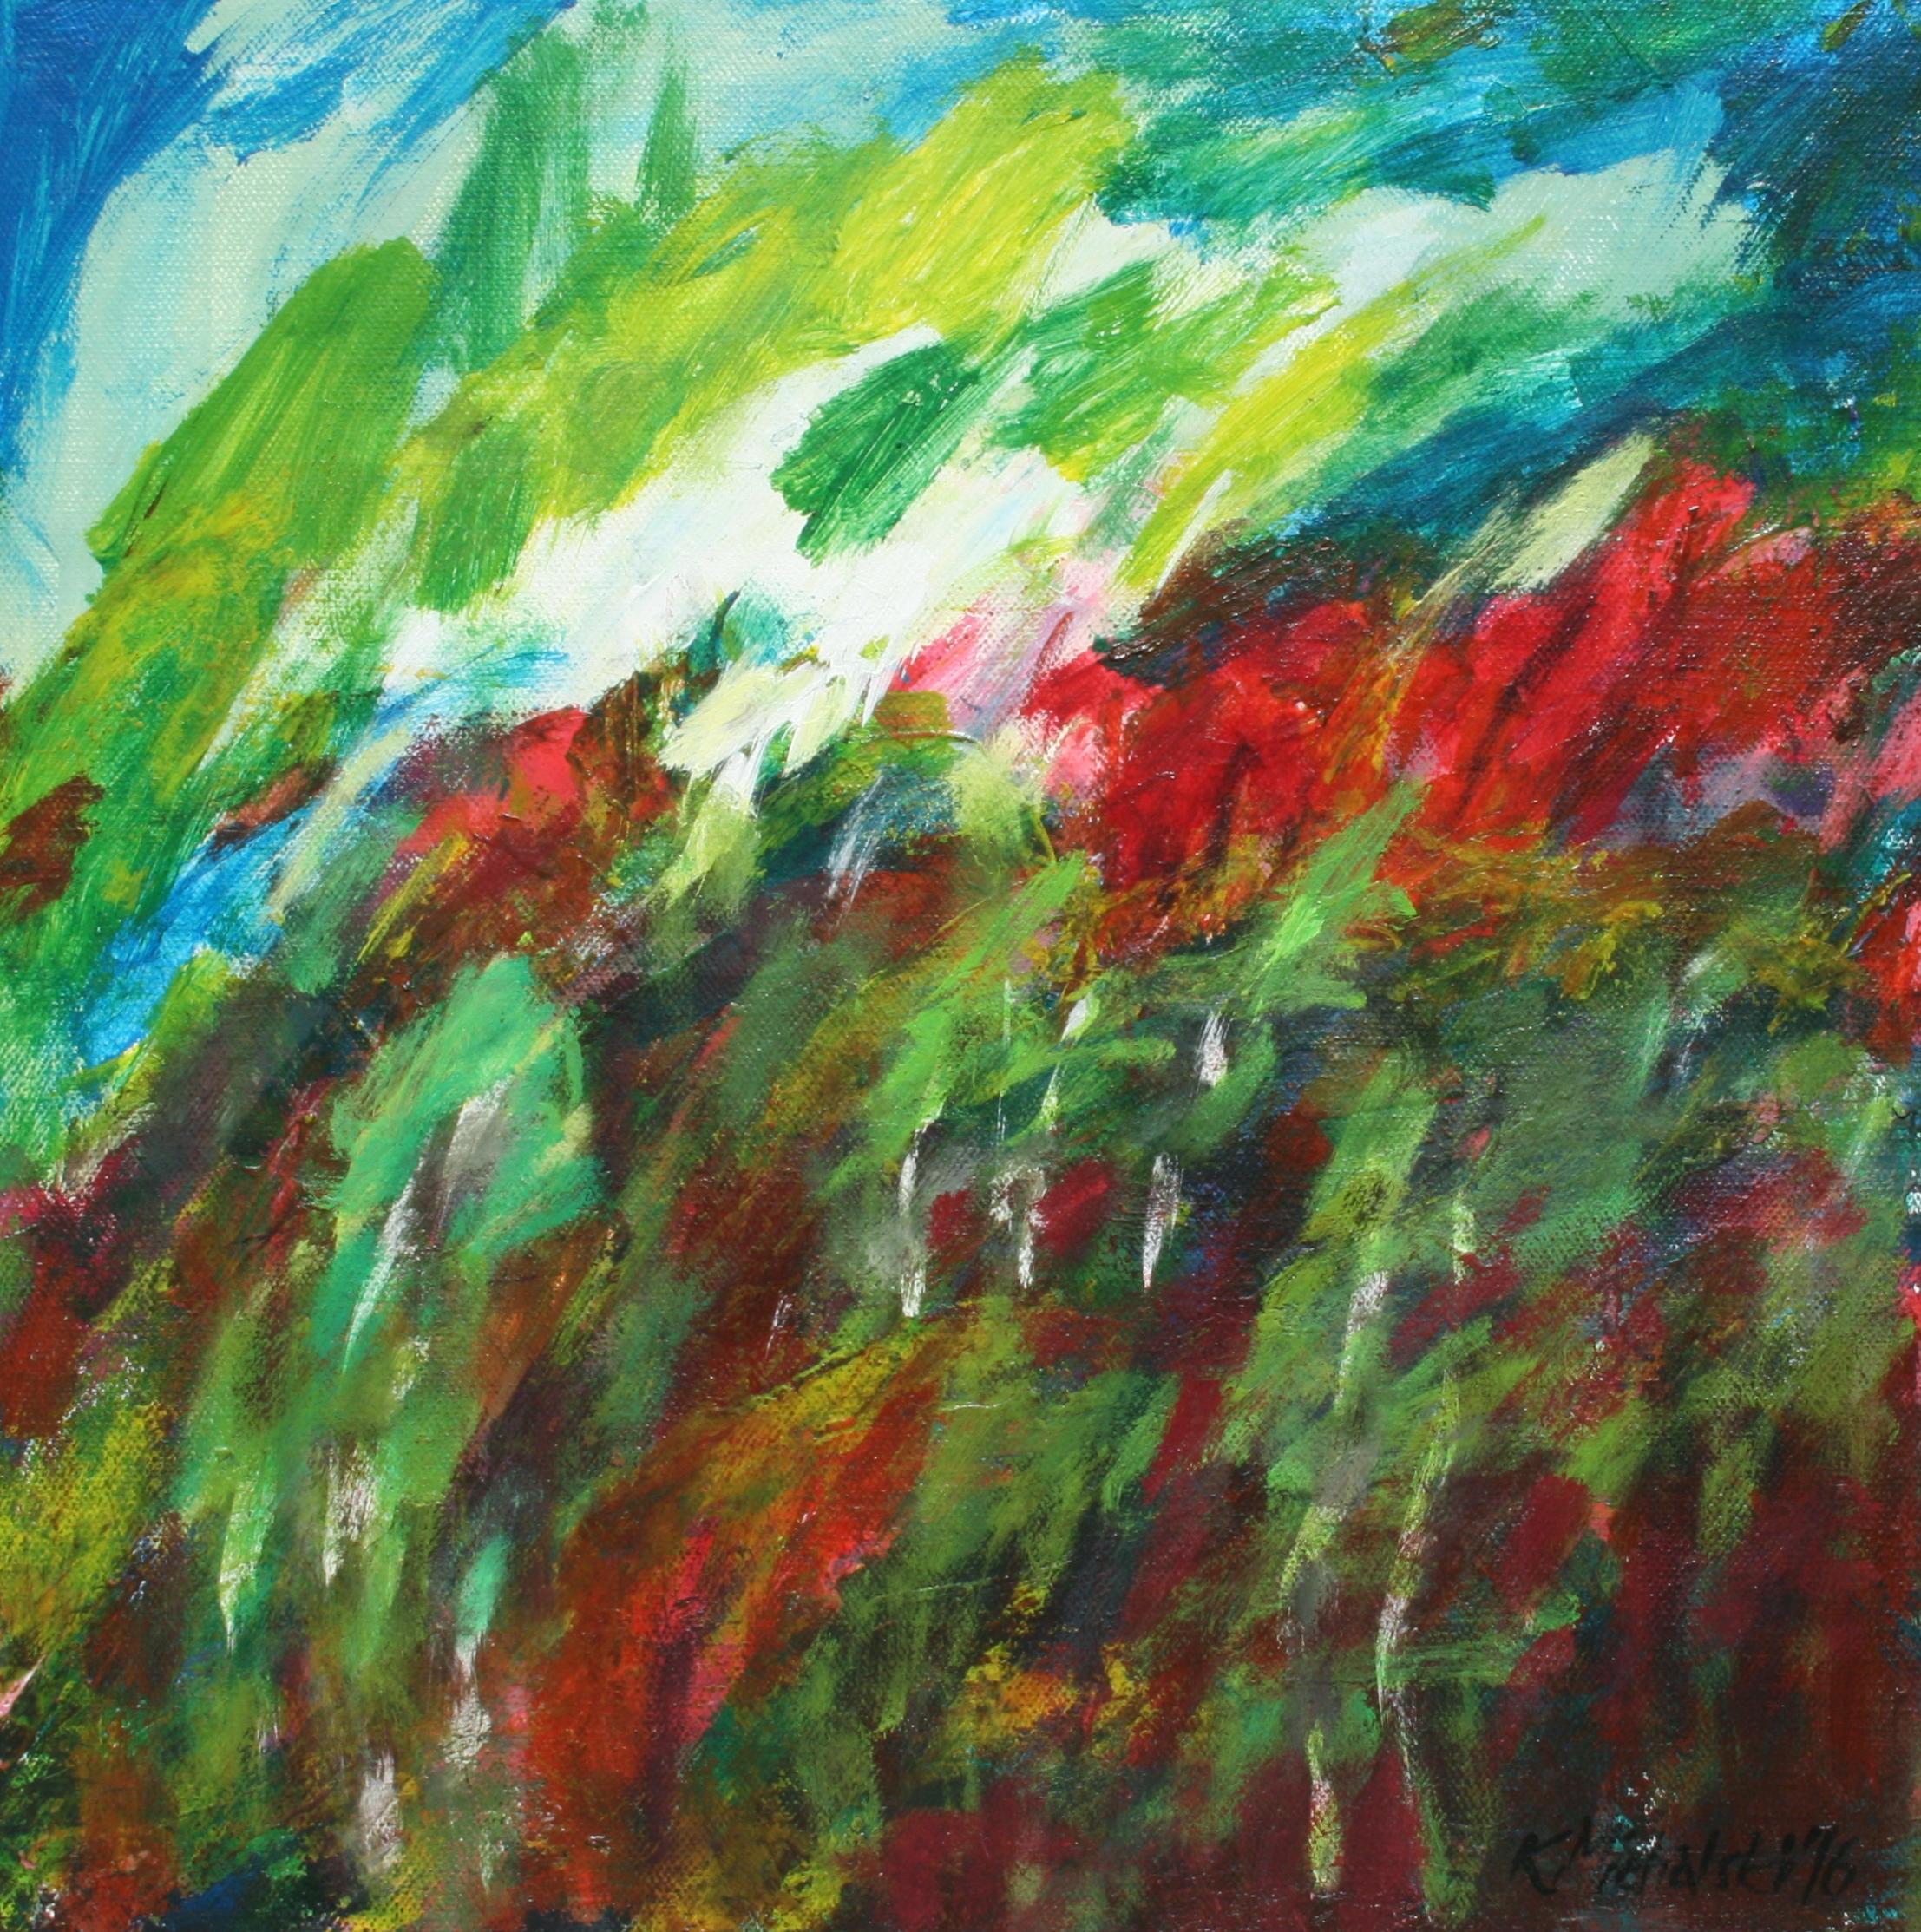 Bunter Wald, 2016, 40 x 40, Acryl auf Leinwand